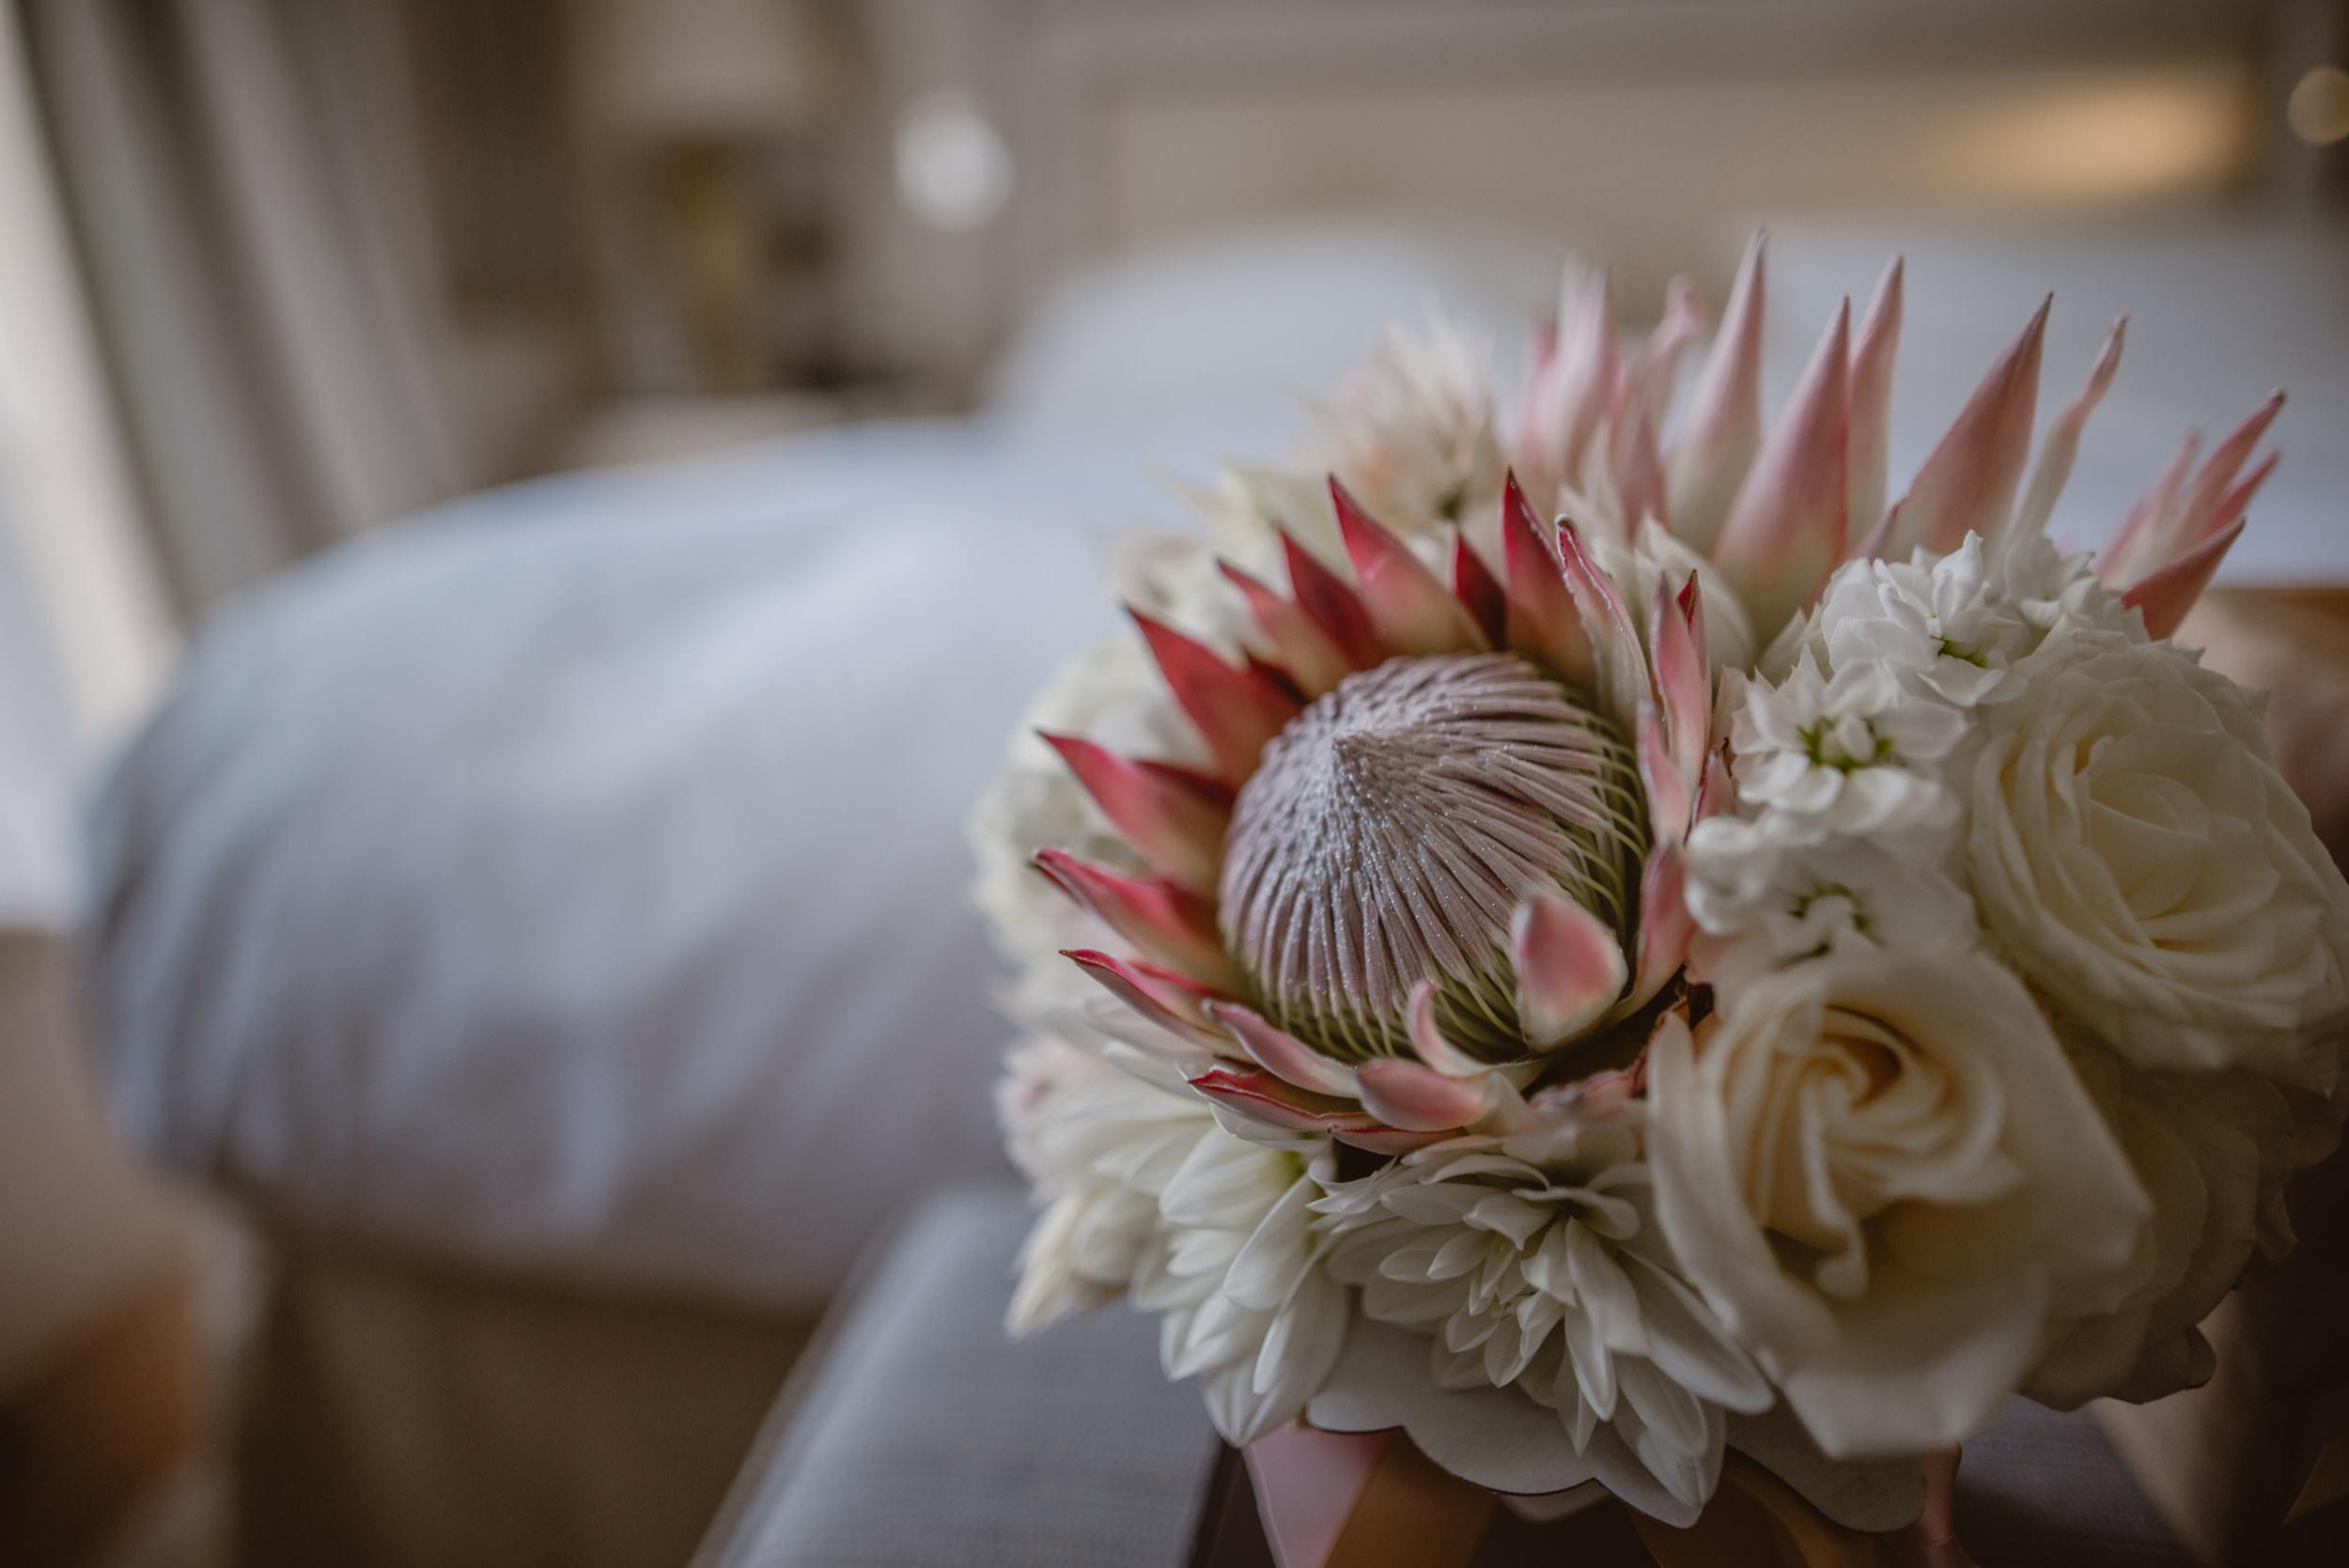 Trisha-and-Roger-wedding-The-Priory-Church-and-Chewton-Glen-Hotel-Christchurch-Manu-Mendoza-Wedding-Photography-005.jpg